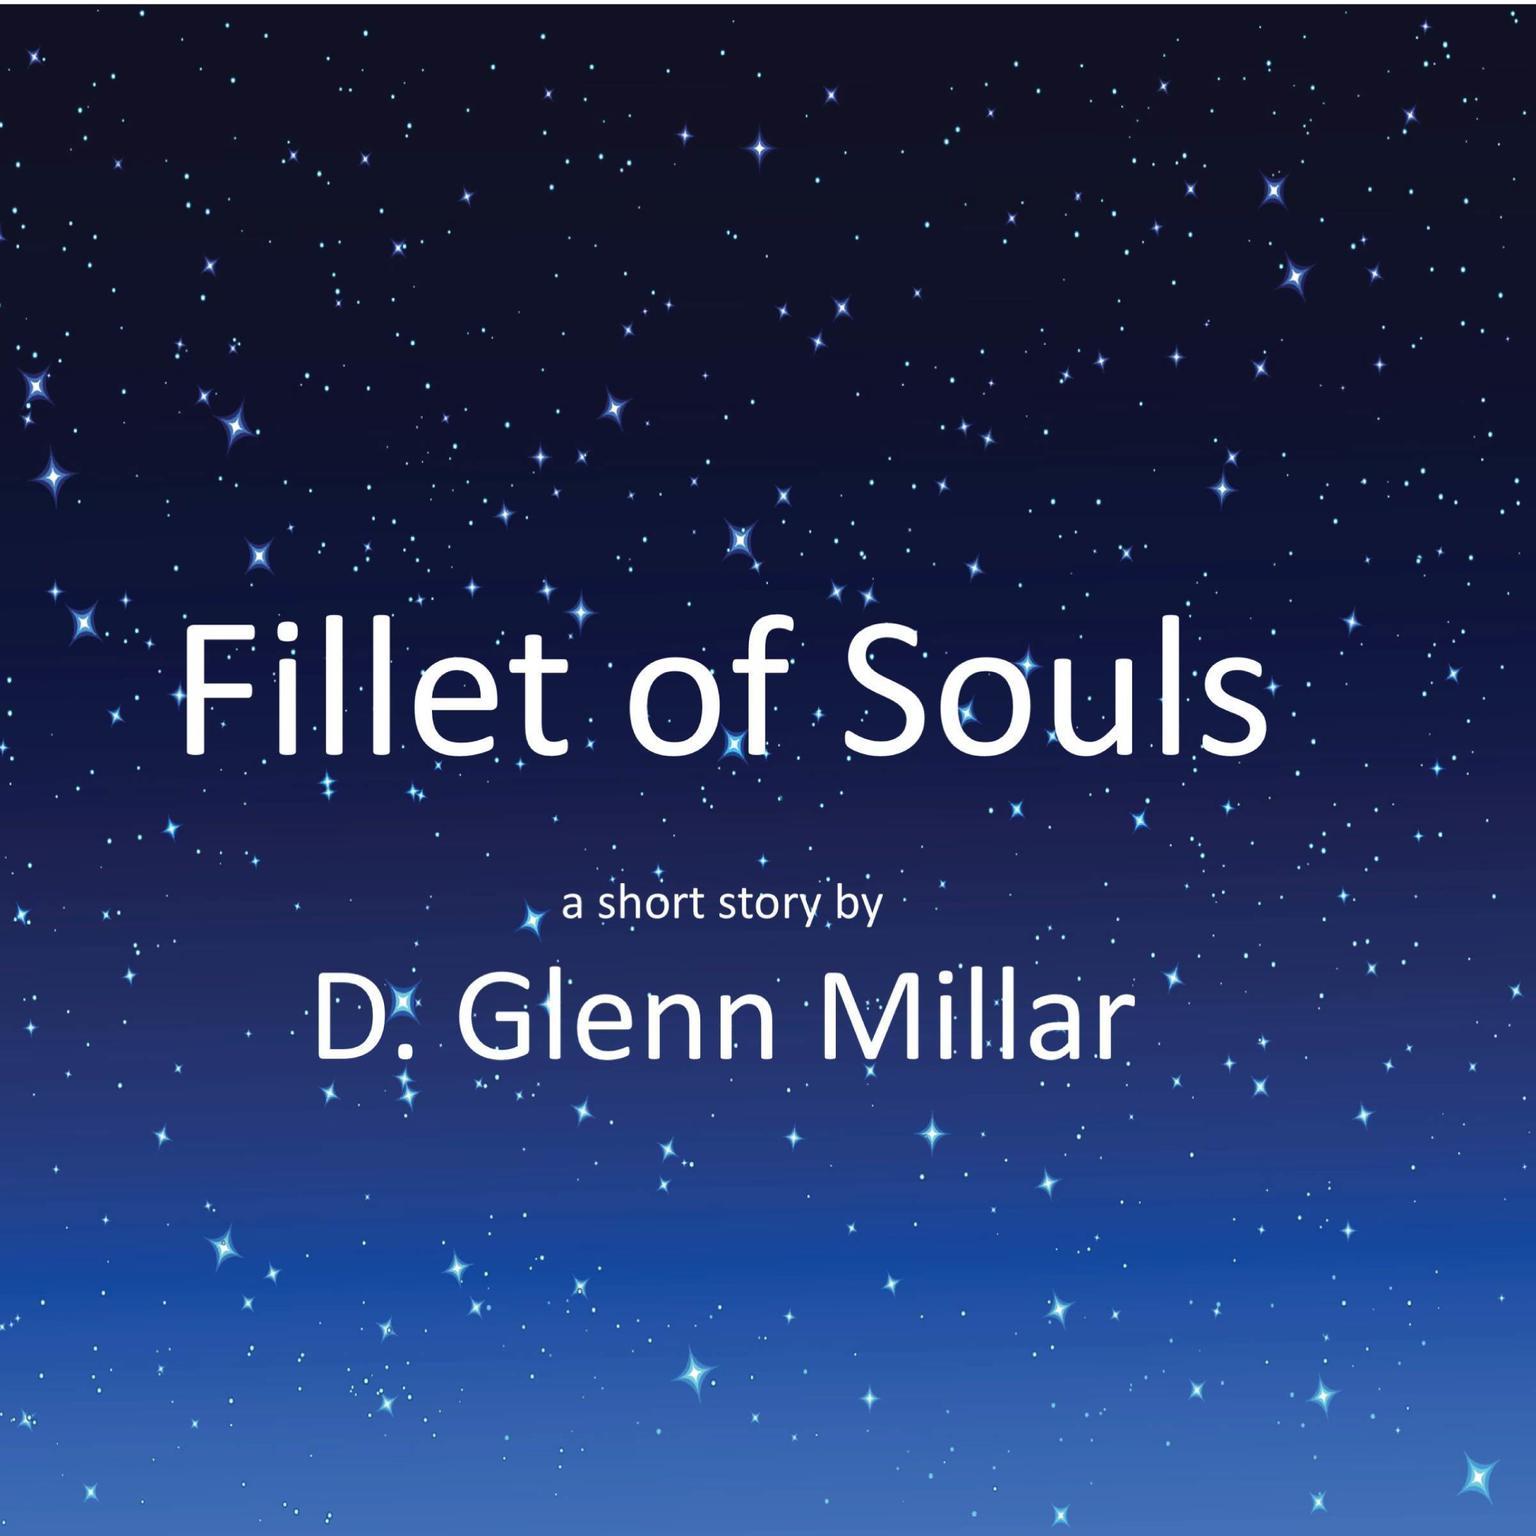 Fillet of Souls Audiobook, by D. Glenn Millar